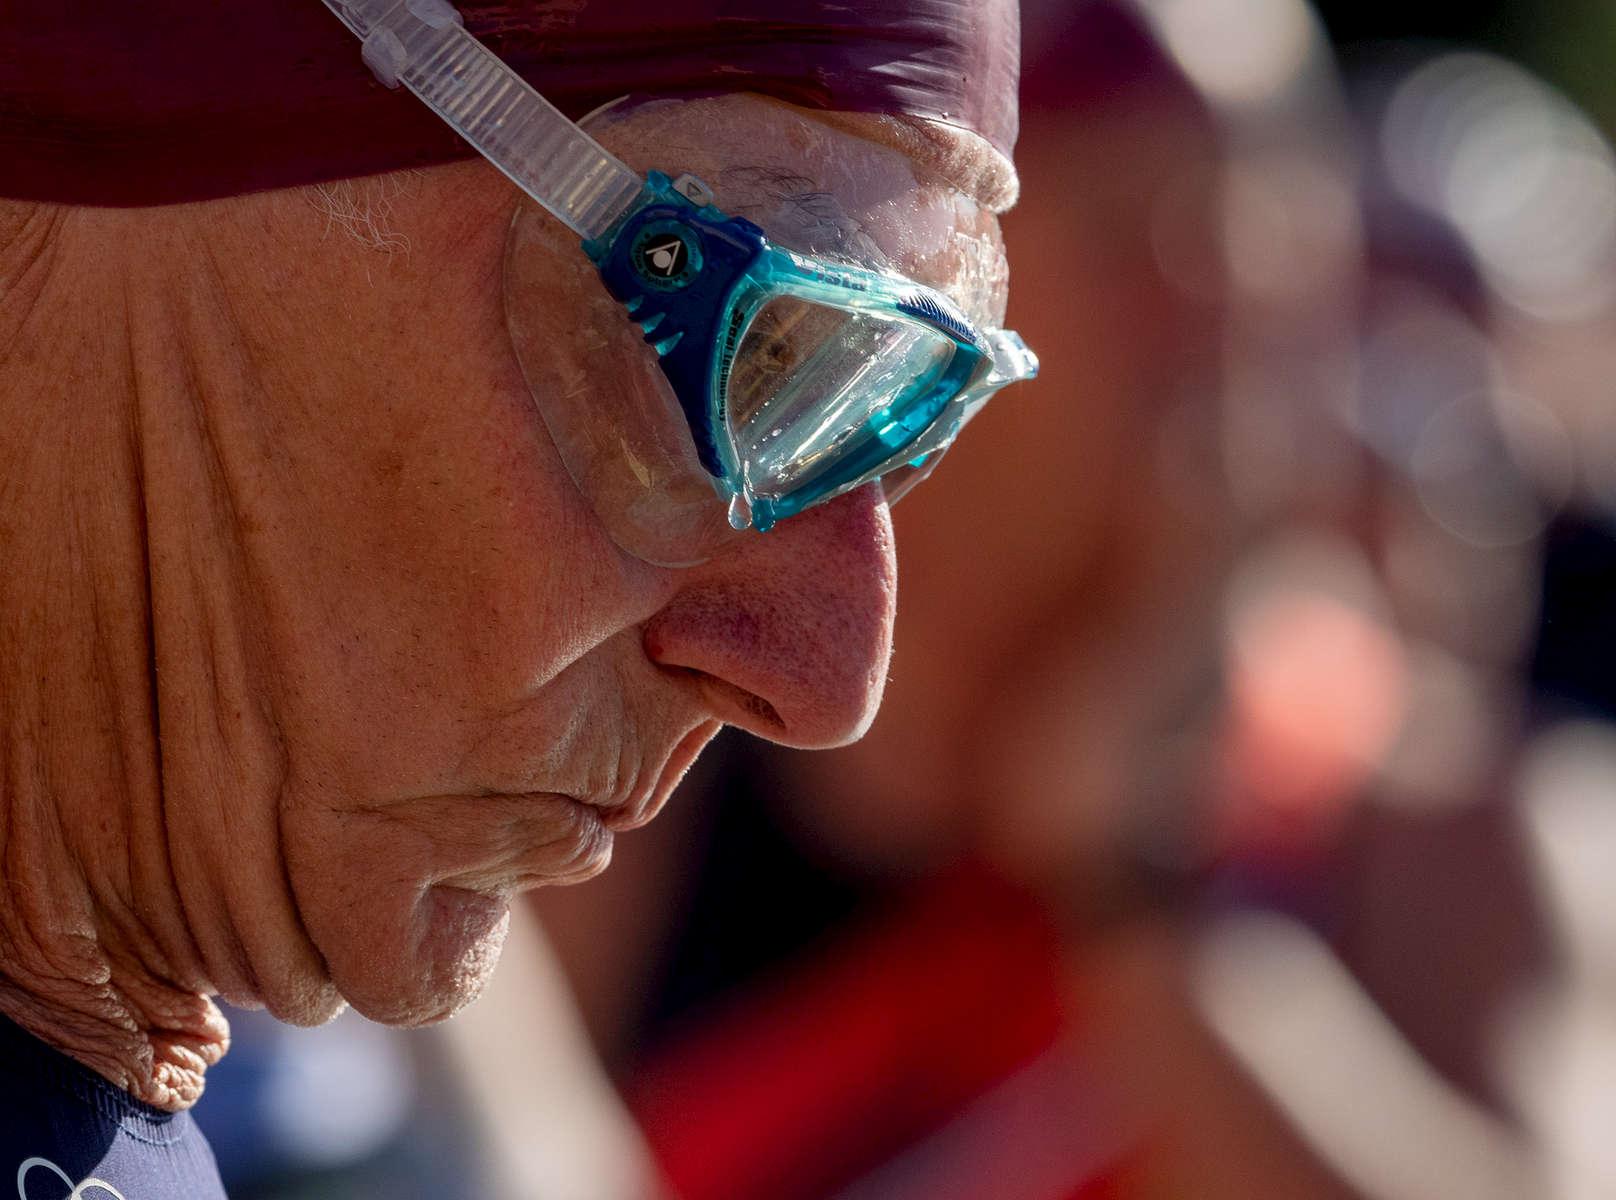 Senior athlete Armand Langevin prepares to compete in the Triathlon during the Huntsman World Senior Games on October 12, 2019 in St. George, Utah.